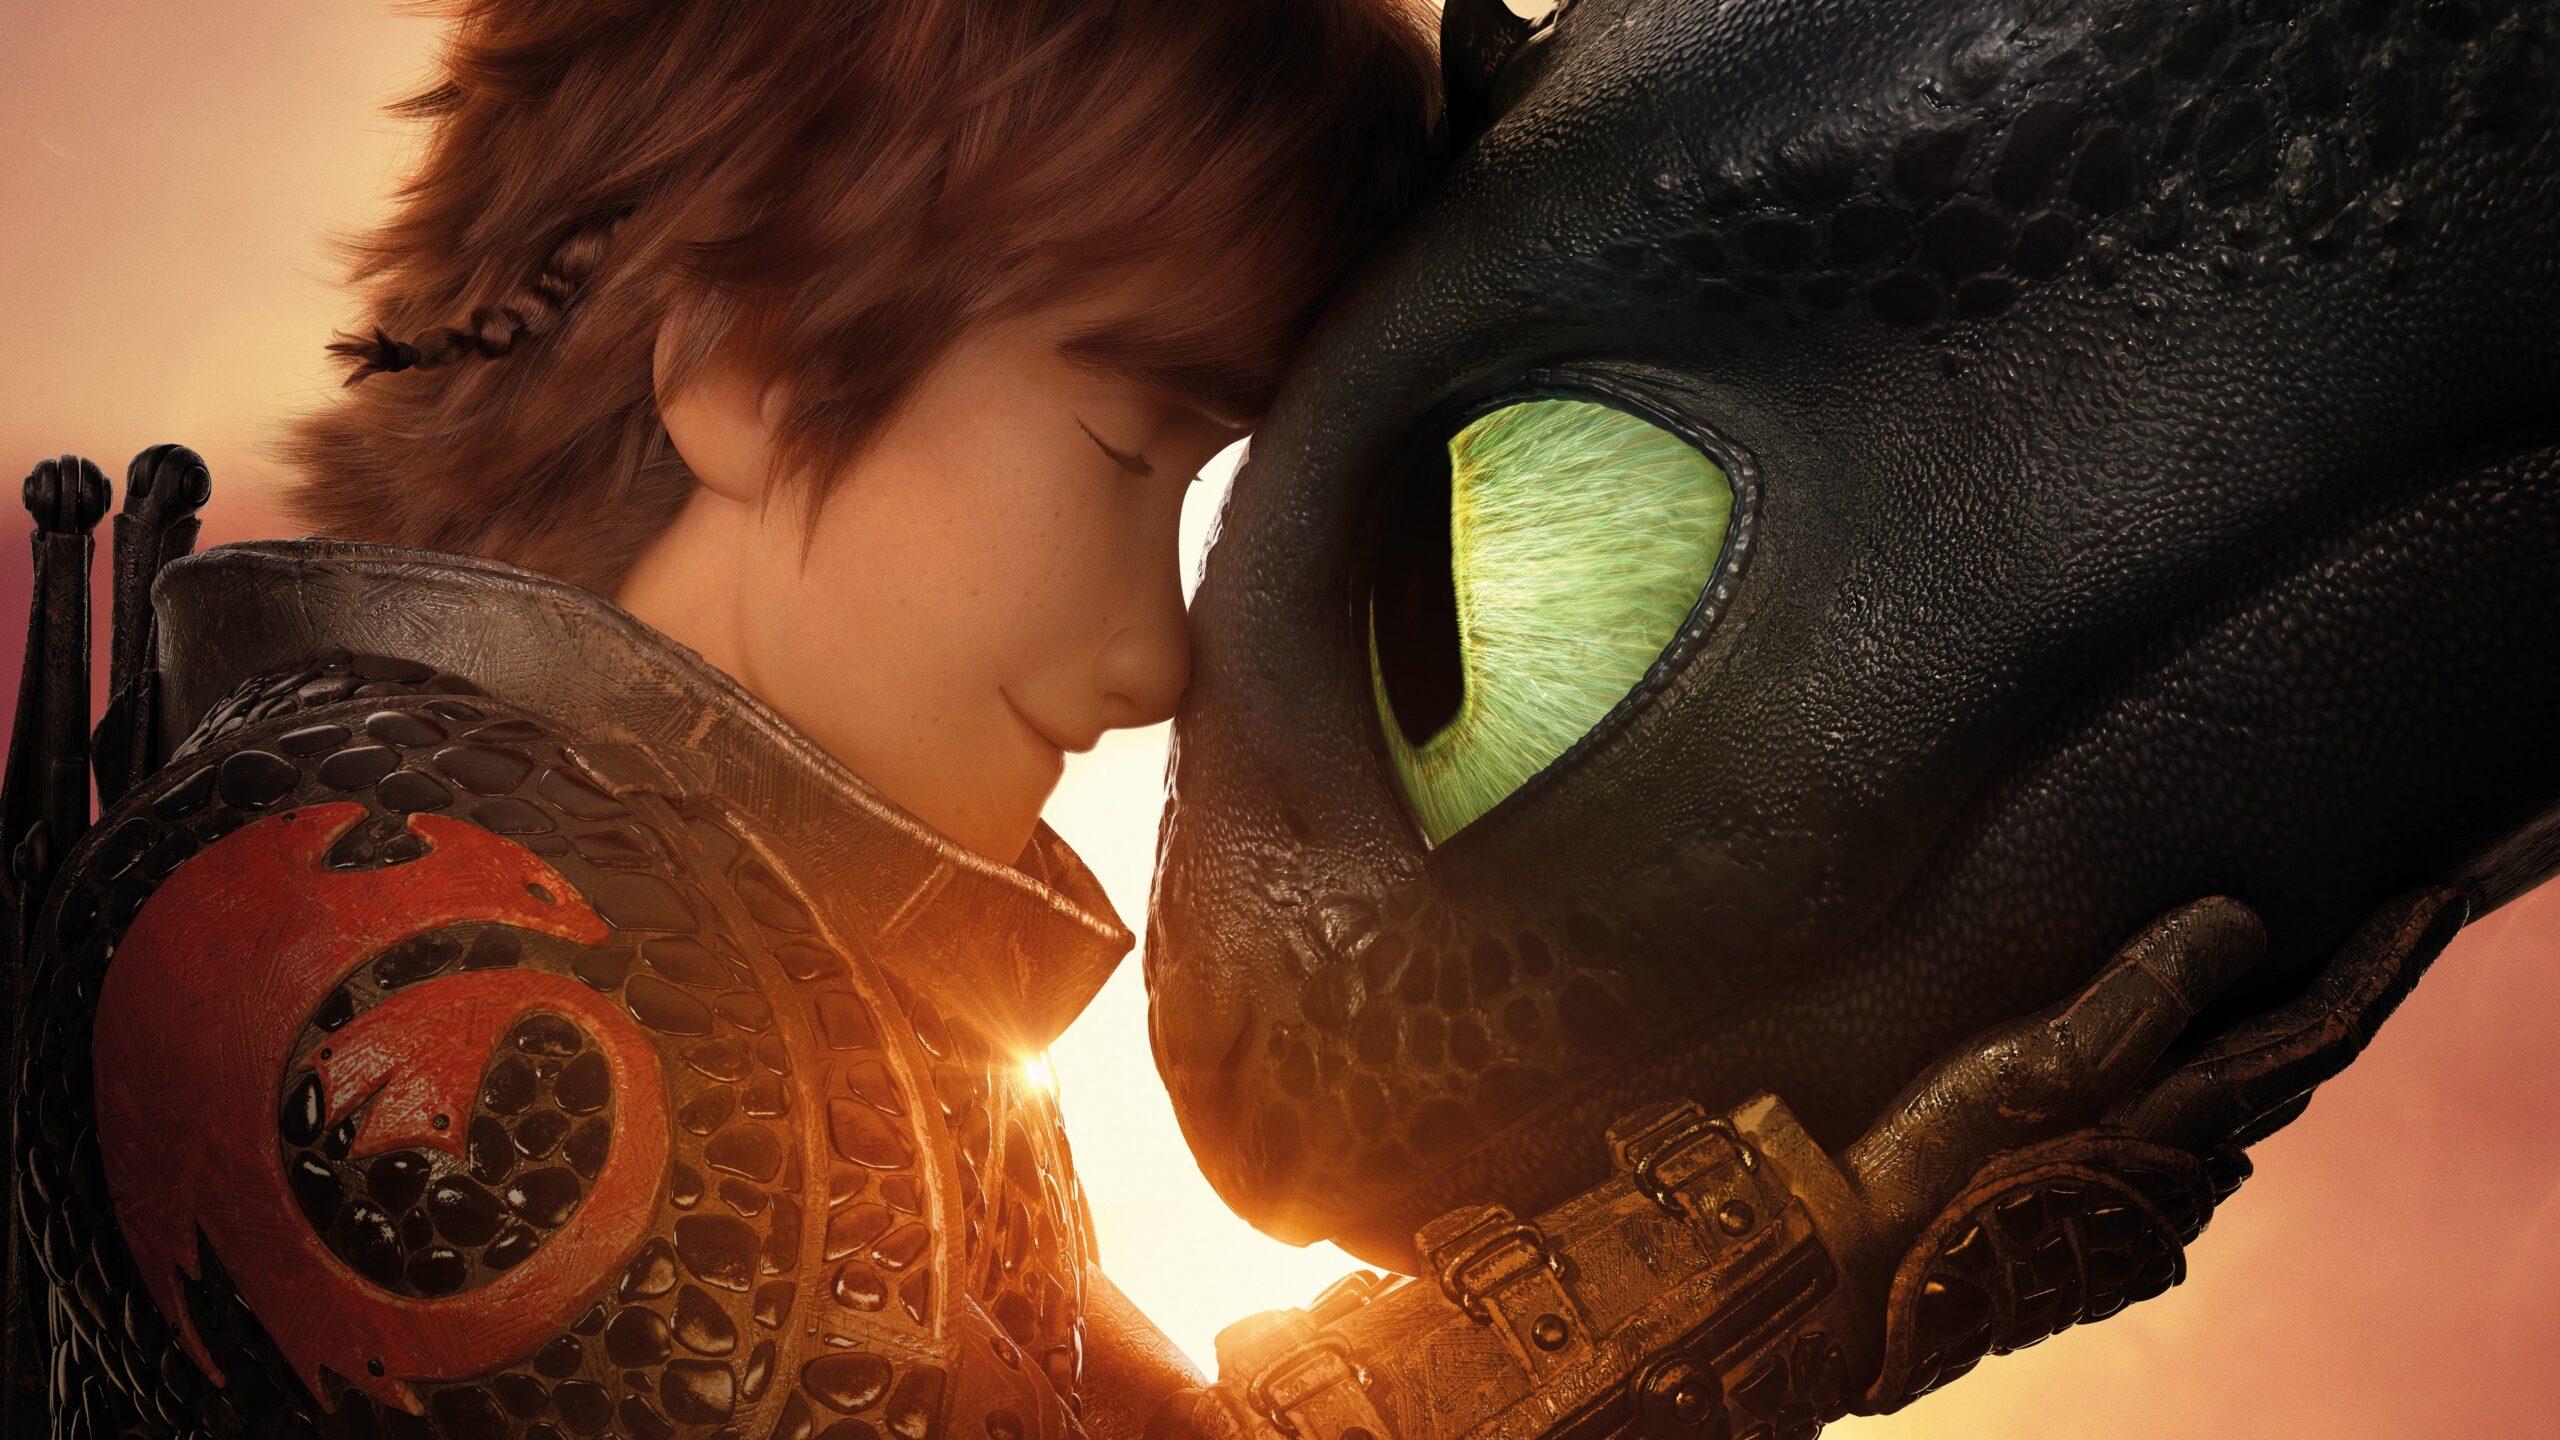 Dragon Trainer, DreamWorks Animation